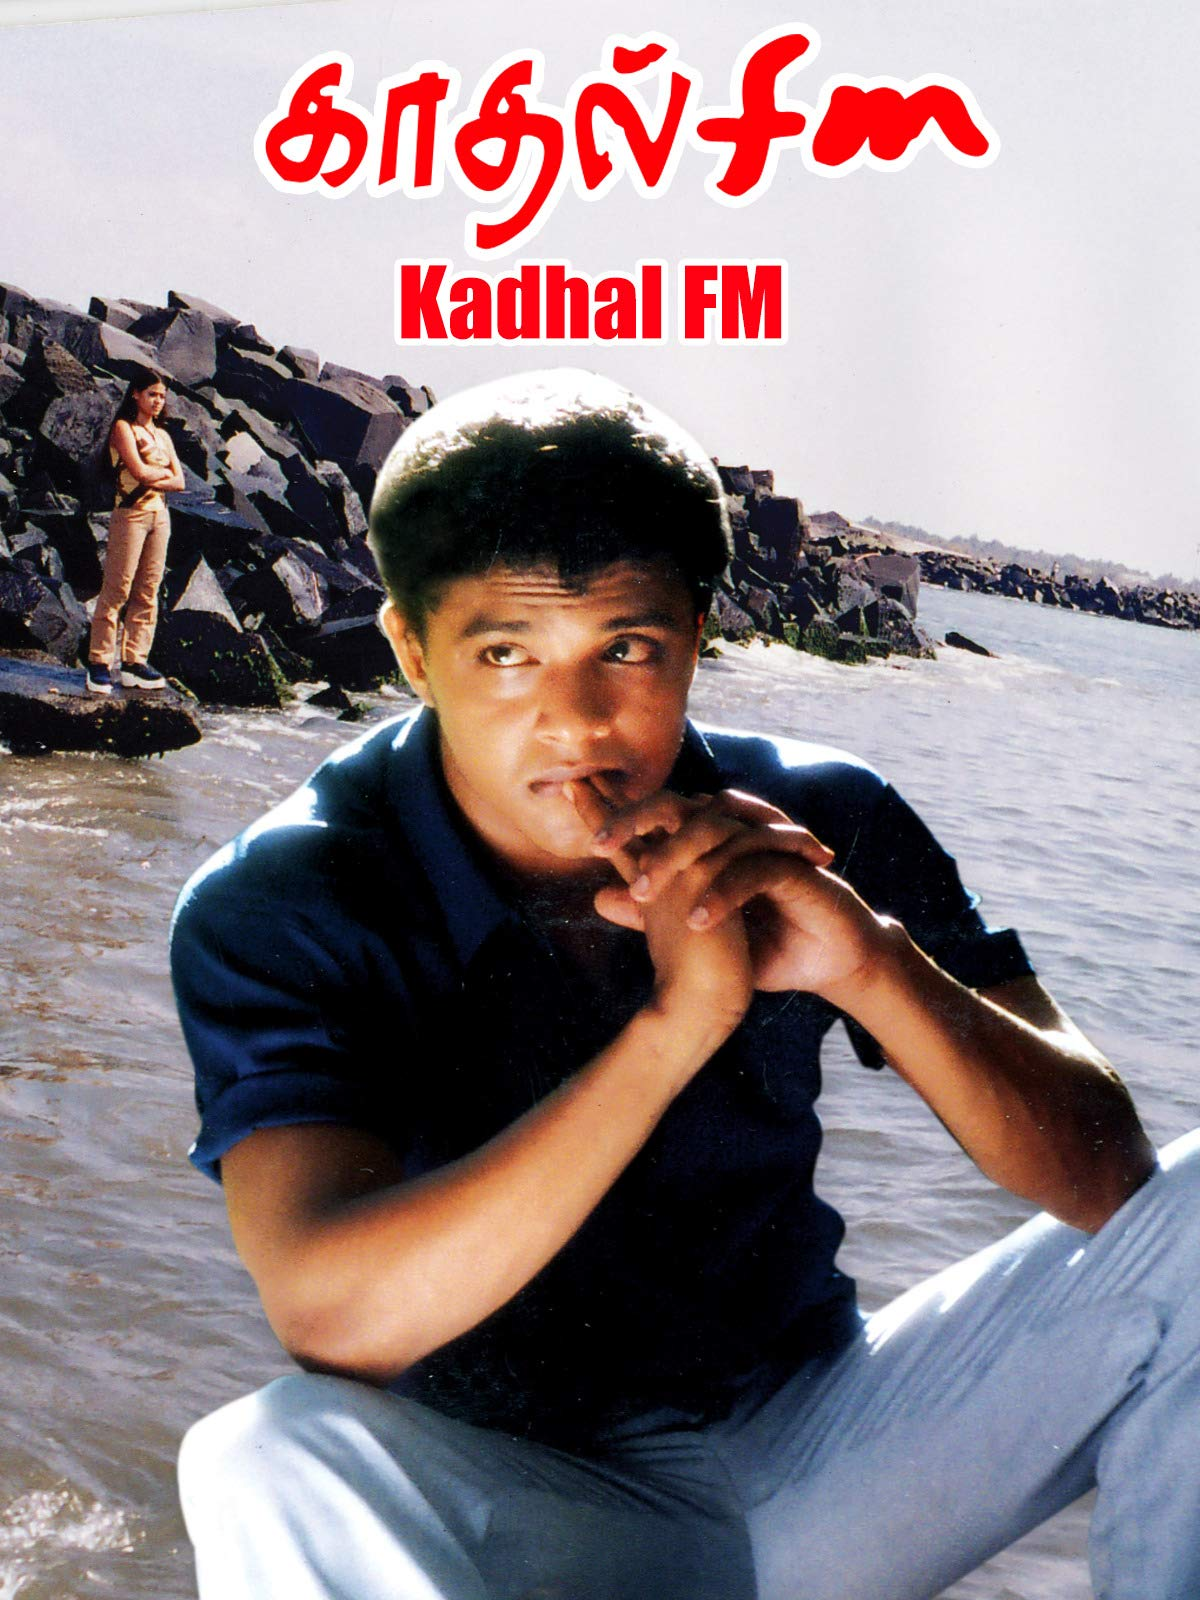 Kadhal FM